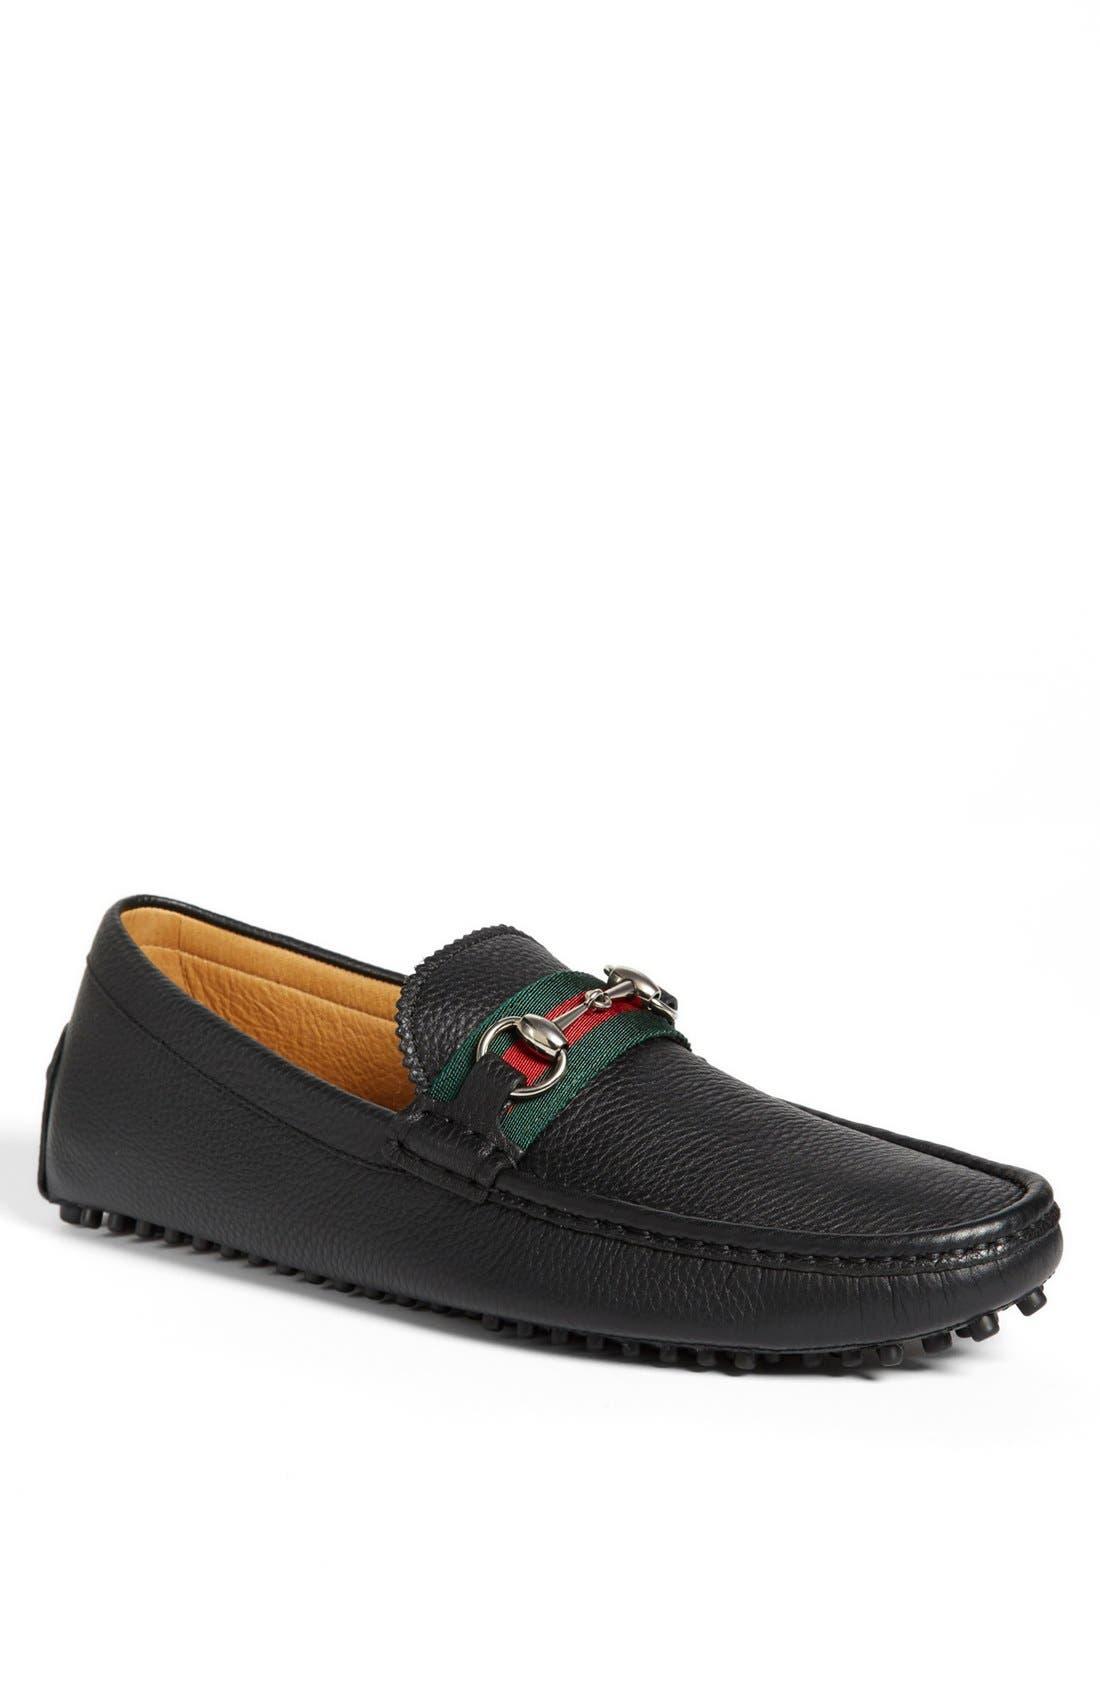 gucci shoes for men price. main image - gucci \u0027damo\u0027 driving shoe (men) shoes for men price |